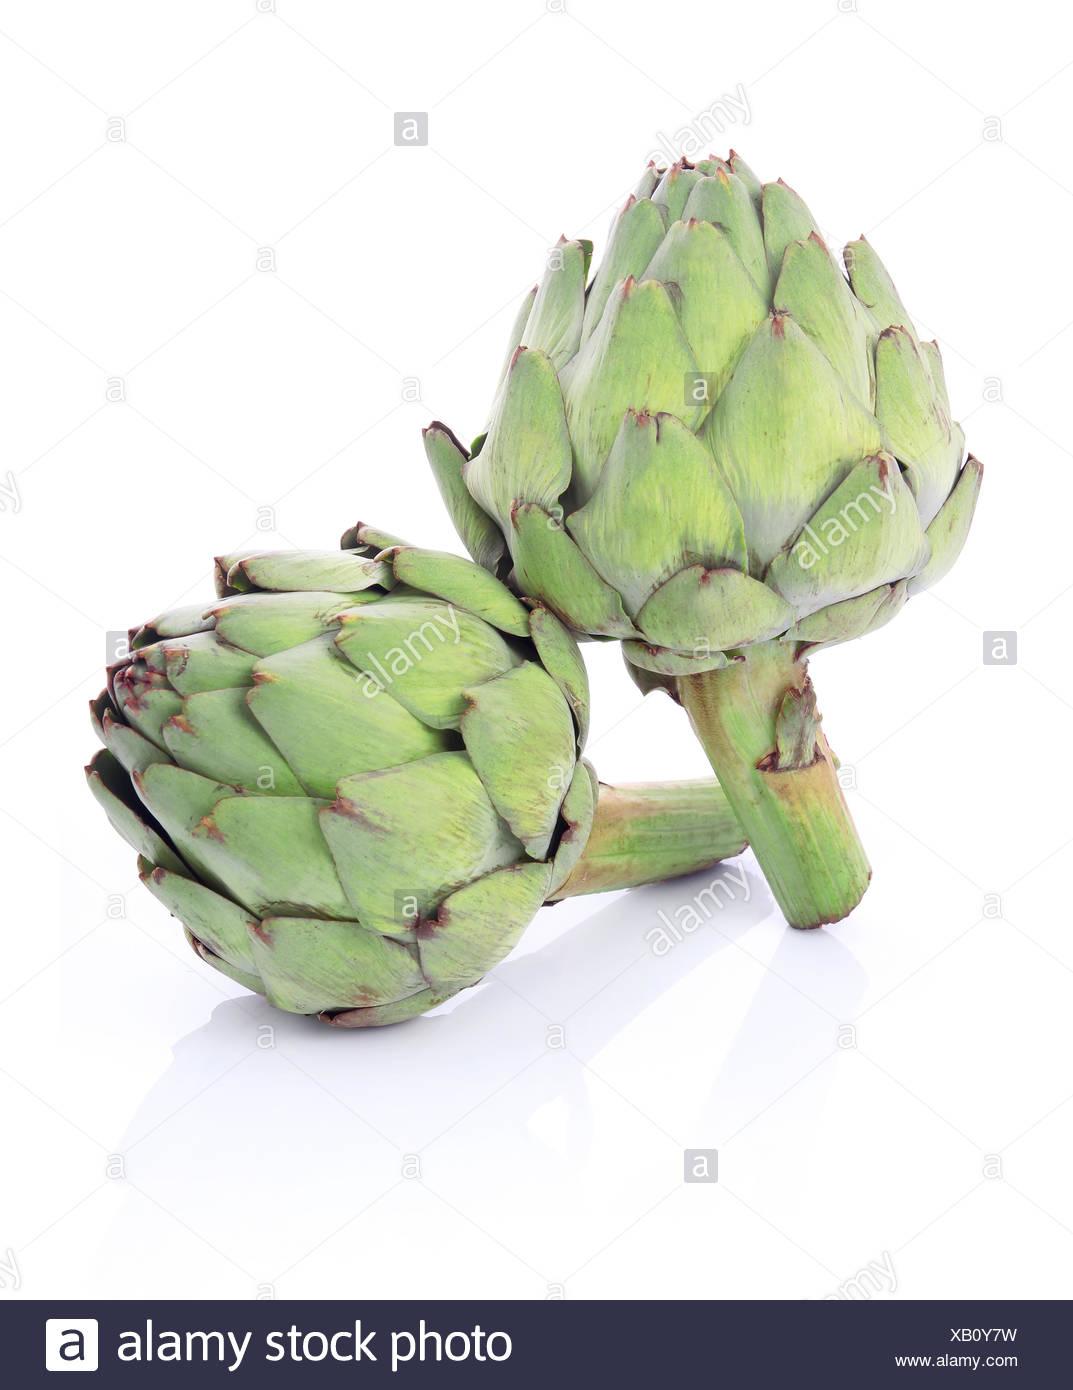 Ripe green artichoke vegetables isolated - Stock Image